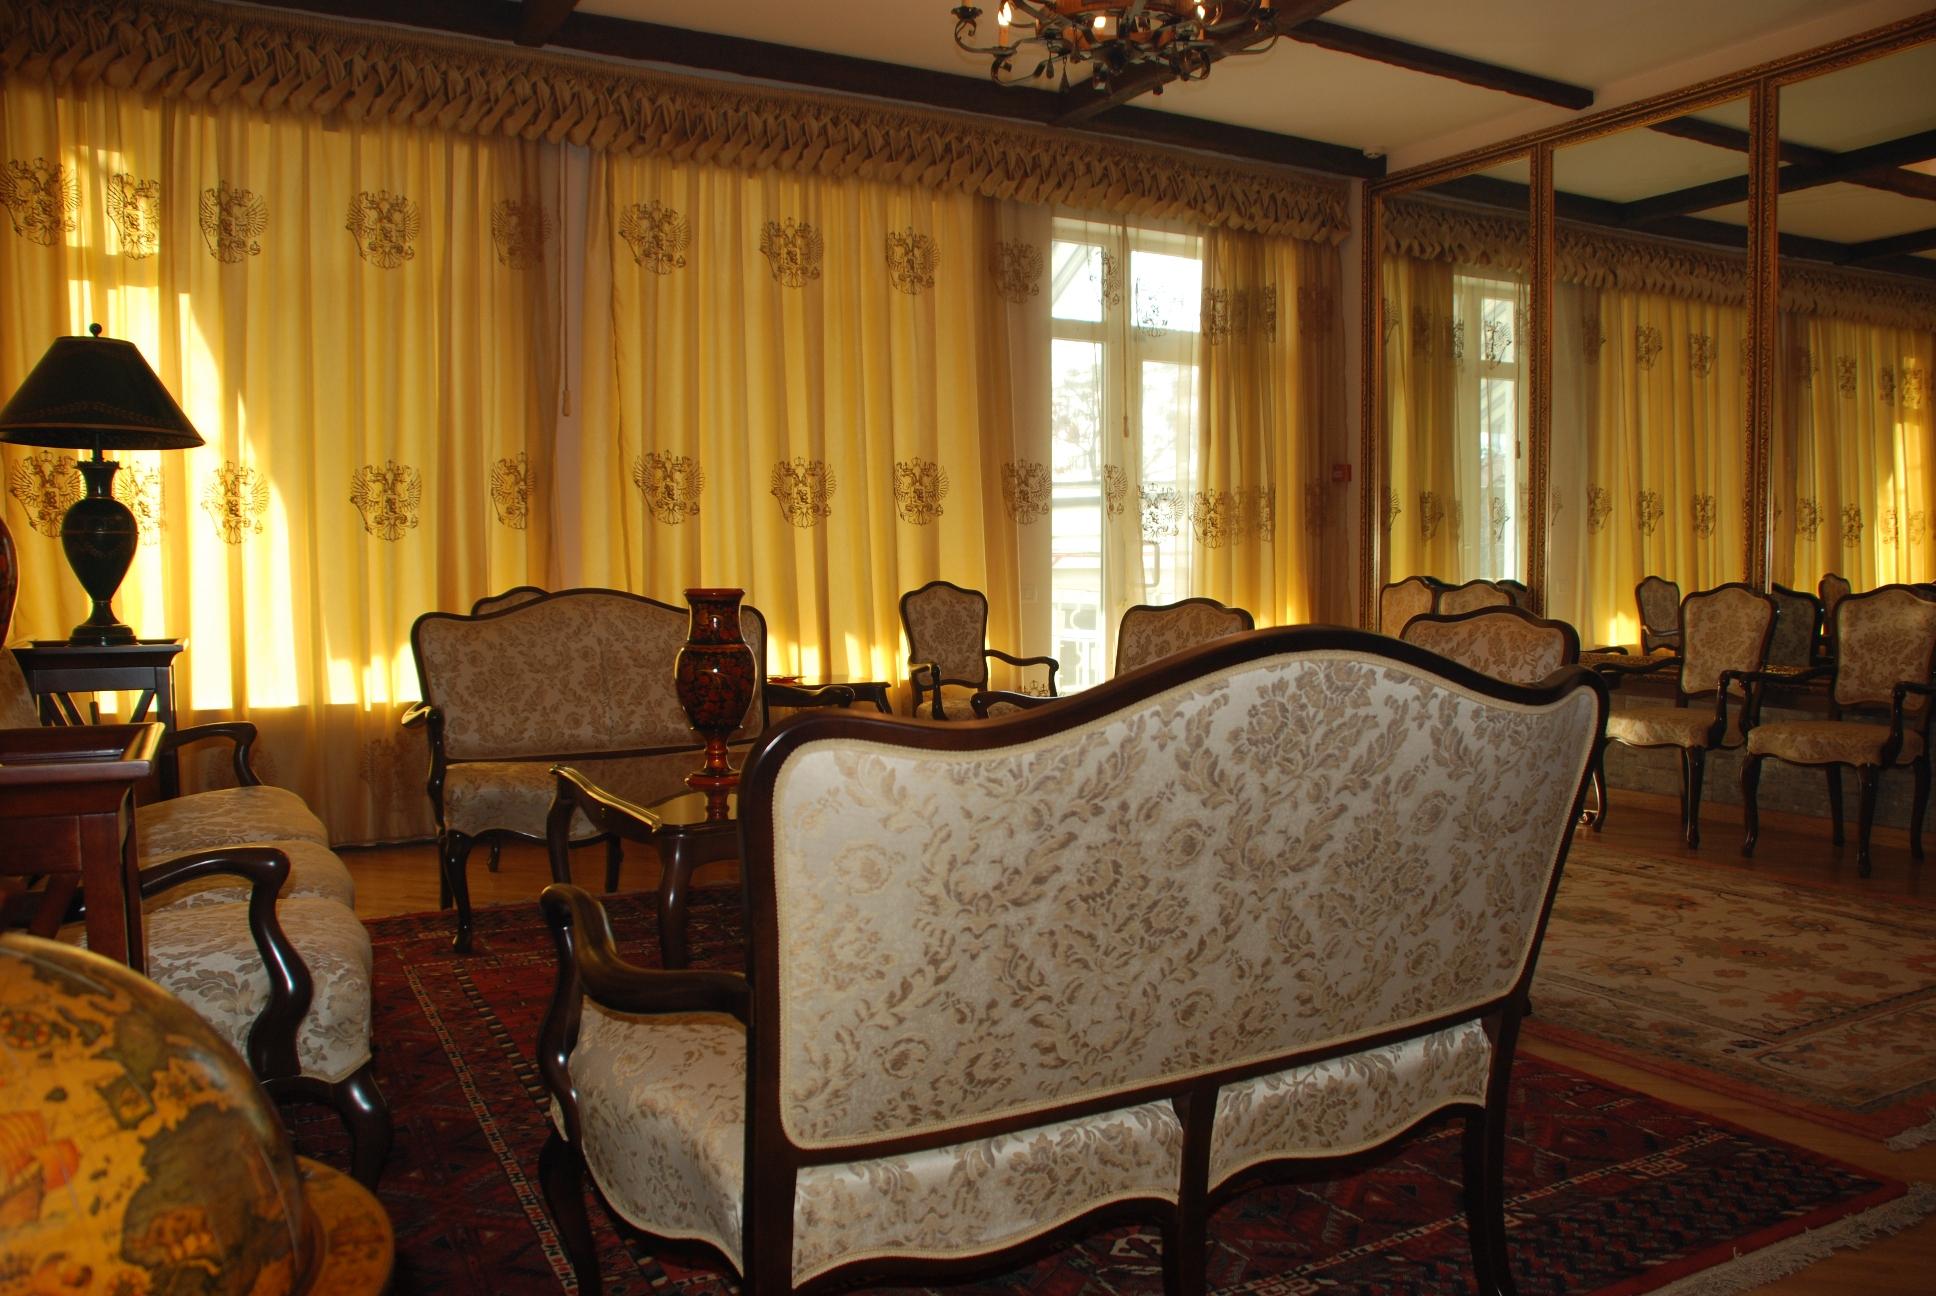 file russian embassy tirana interior 1 jpg wikimedia commons